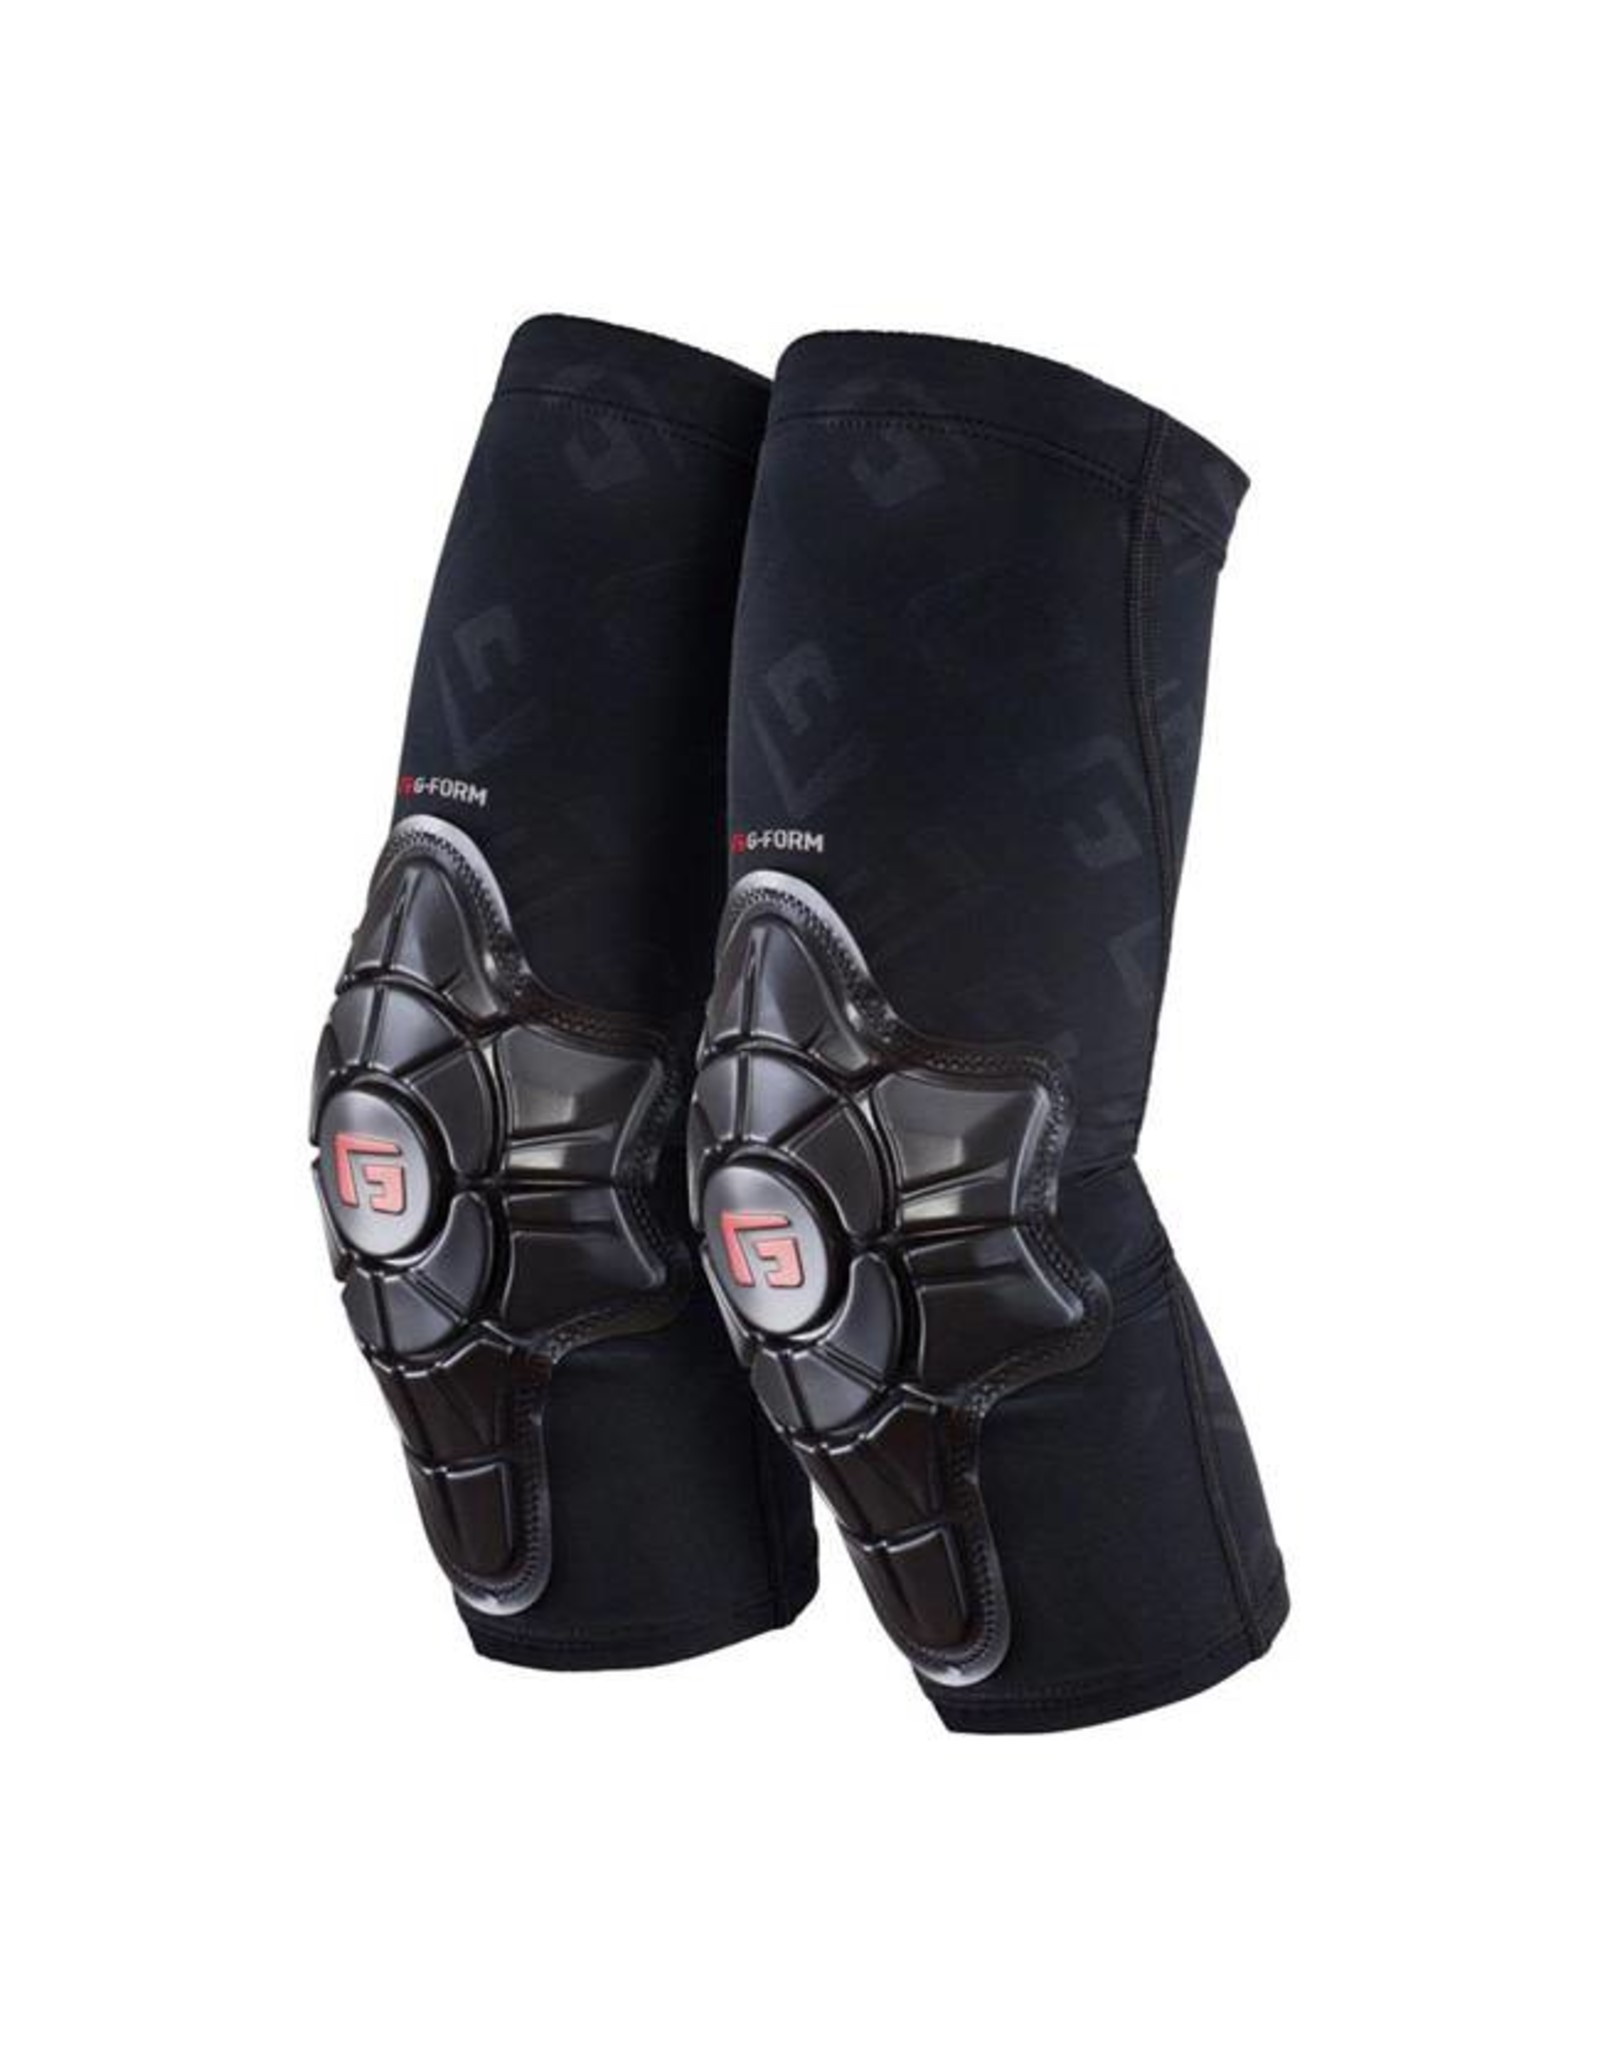 G-Form G-Form Pro-X Elbow Pad: Black/Embossed G, LG